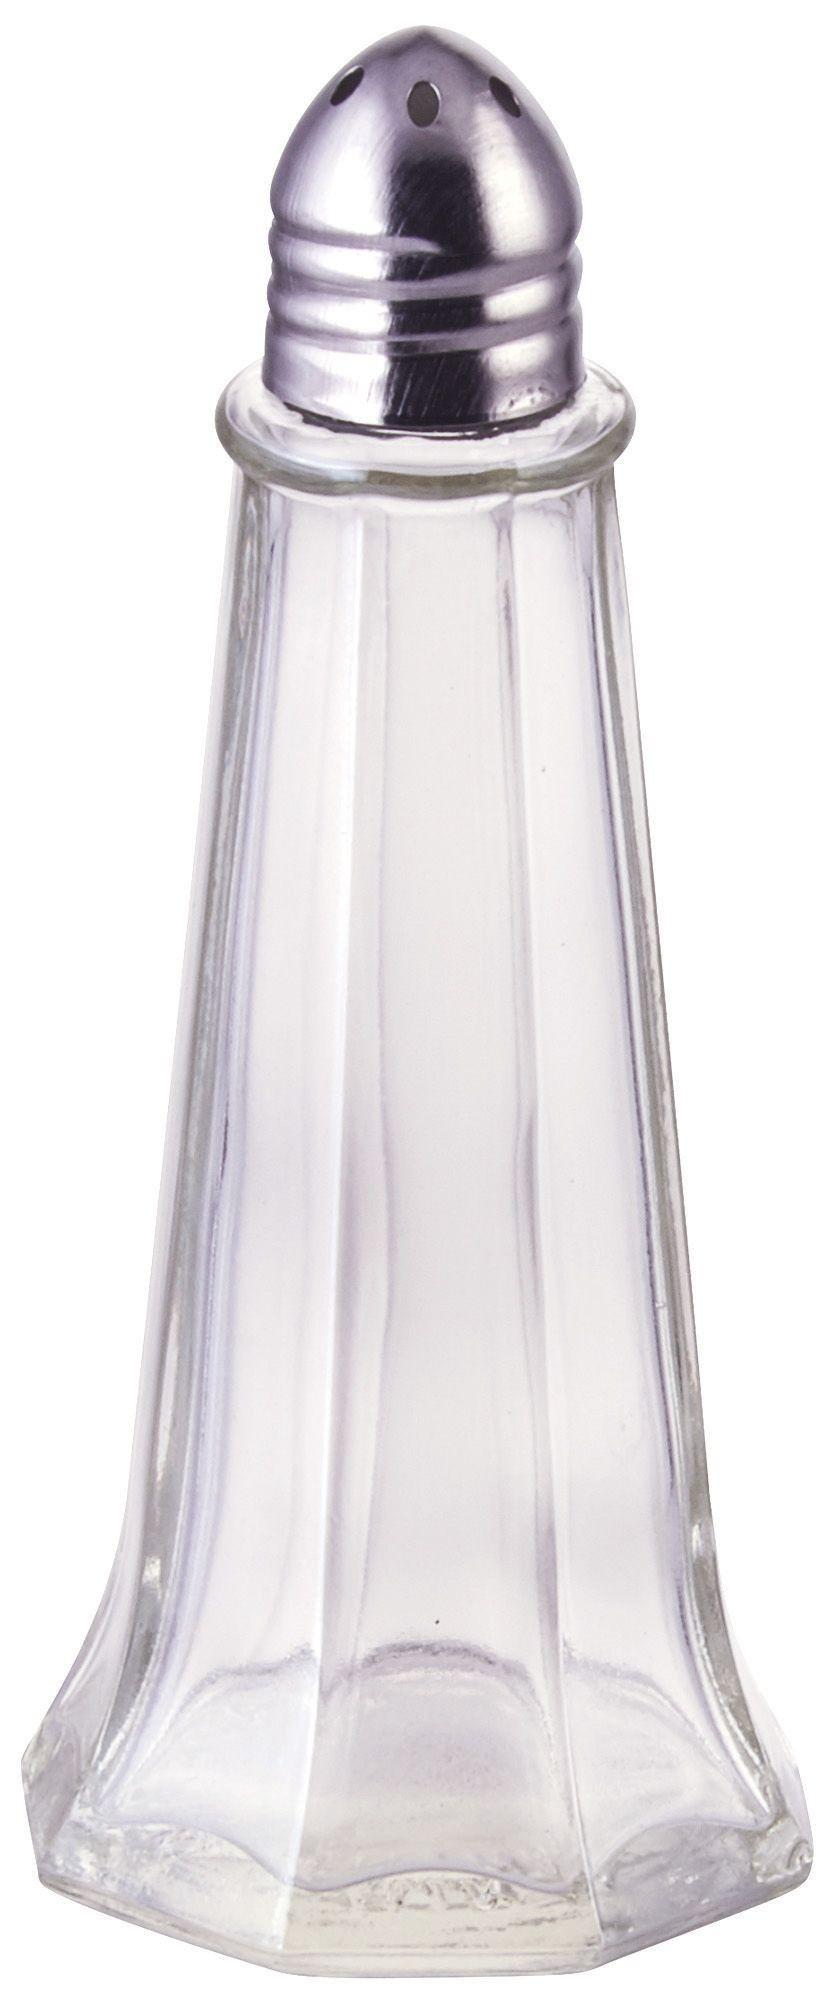 "24 Nostalgic Square Design Glass Salt /& Pepper Shakers case /""Free Shipping!/"""